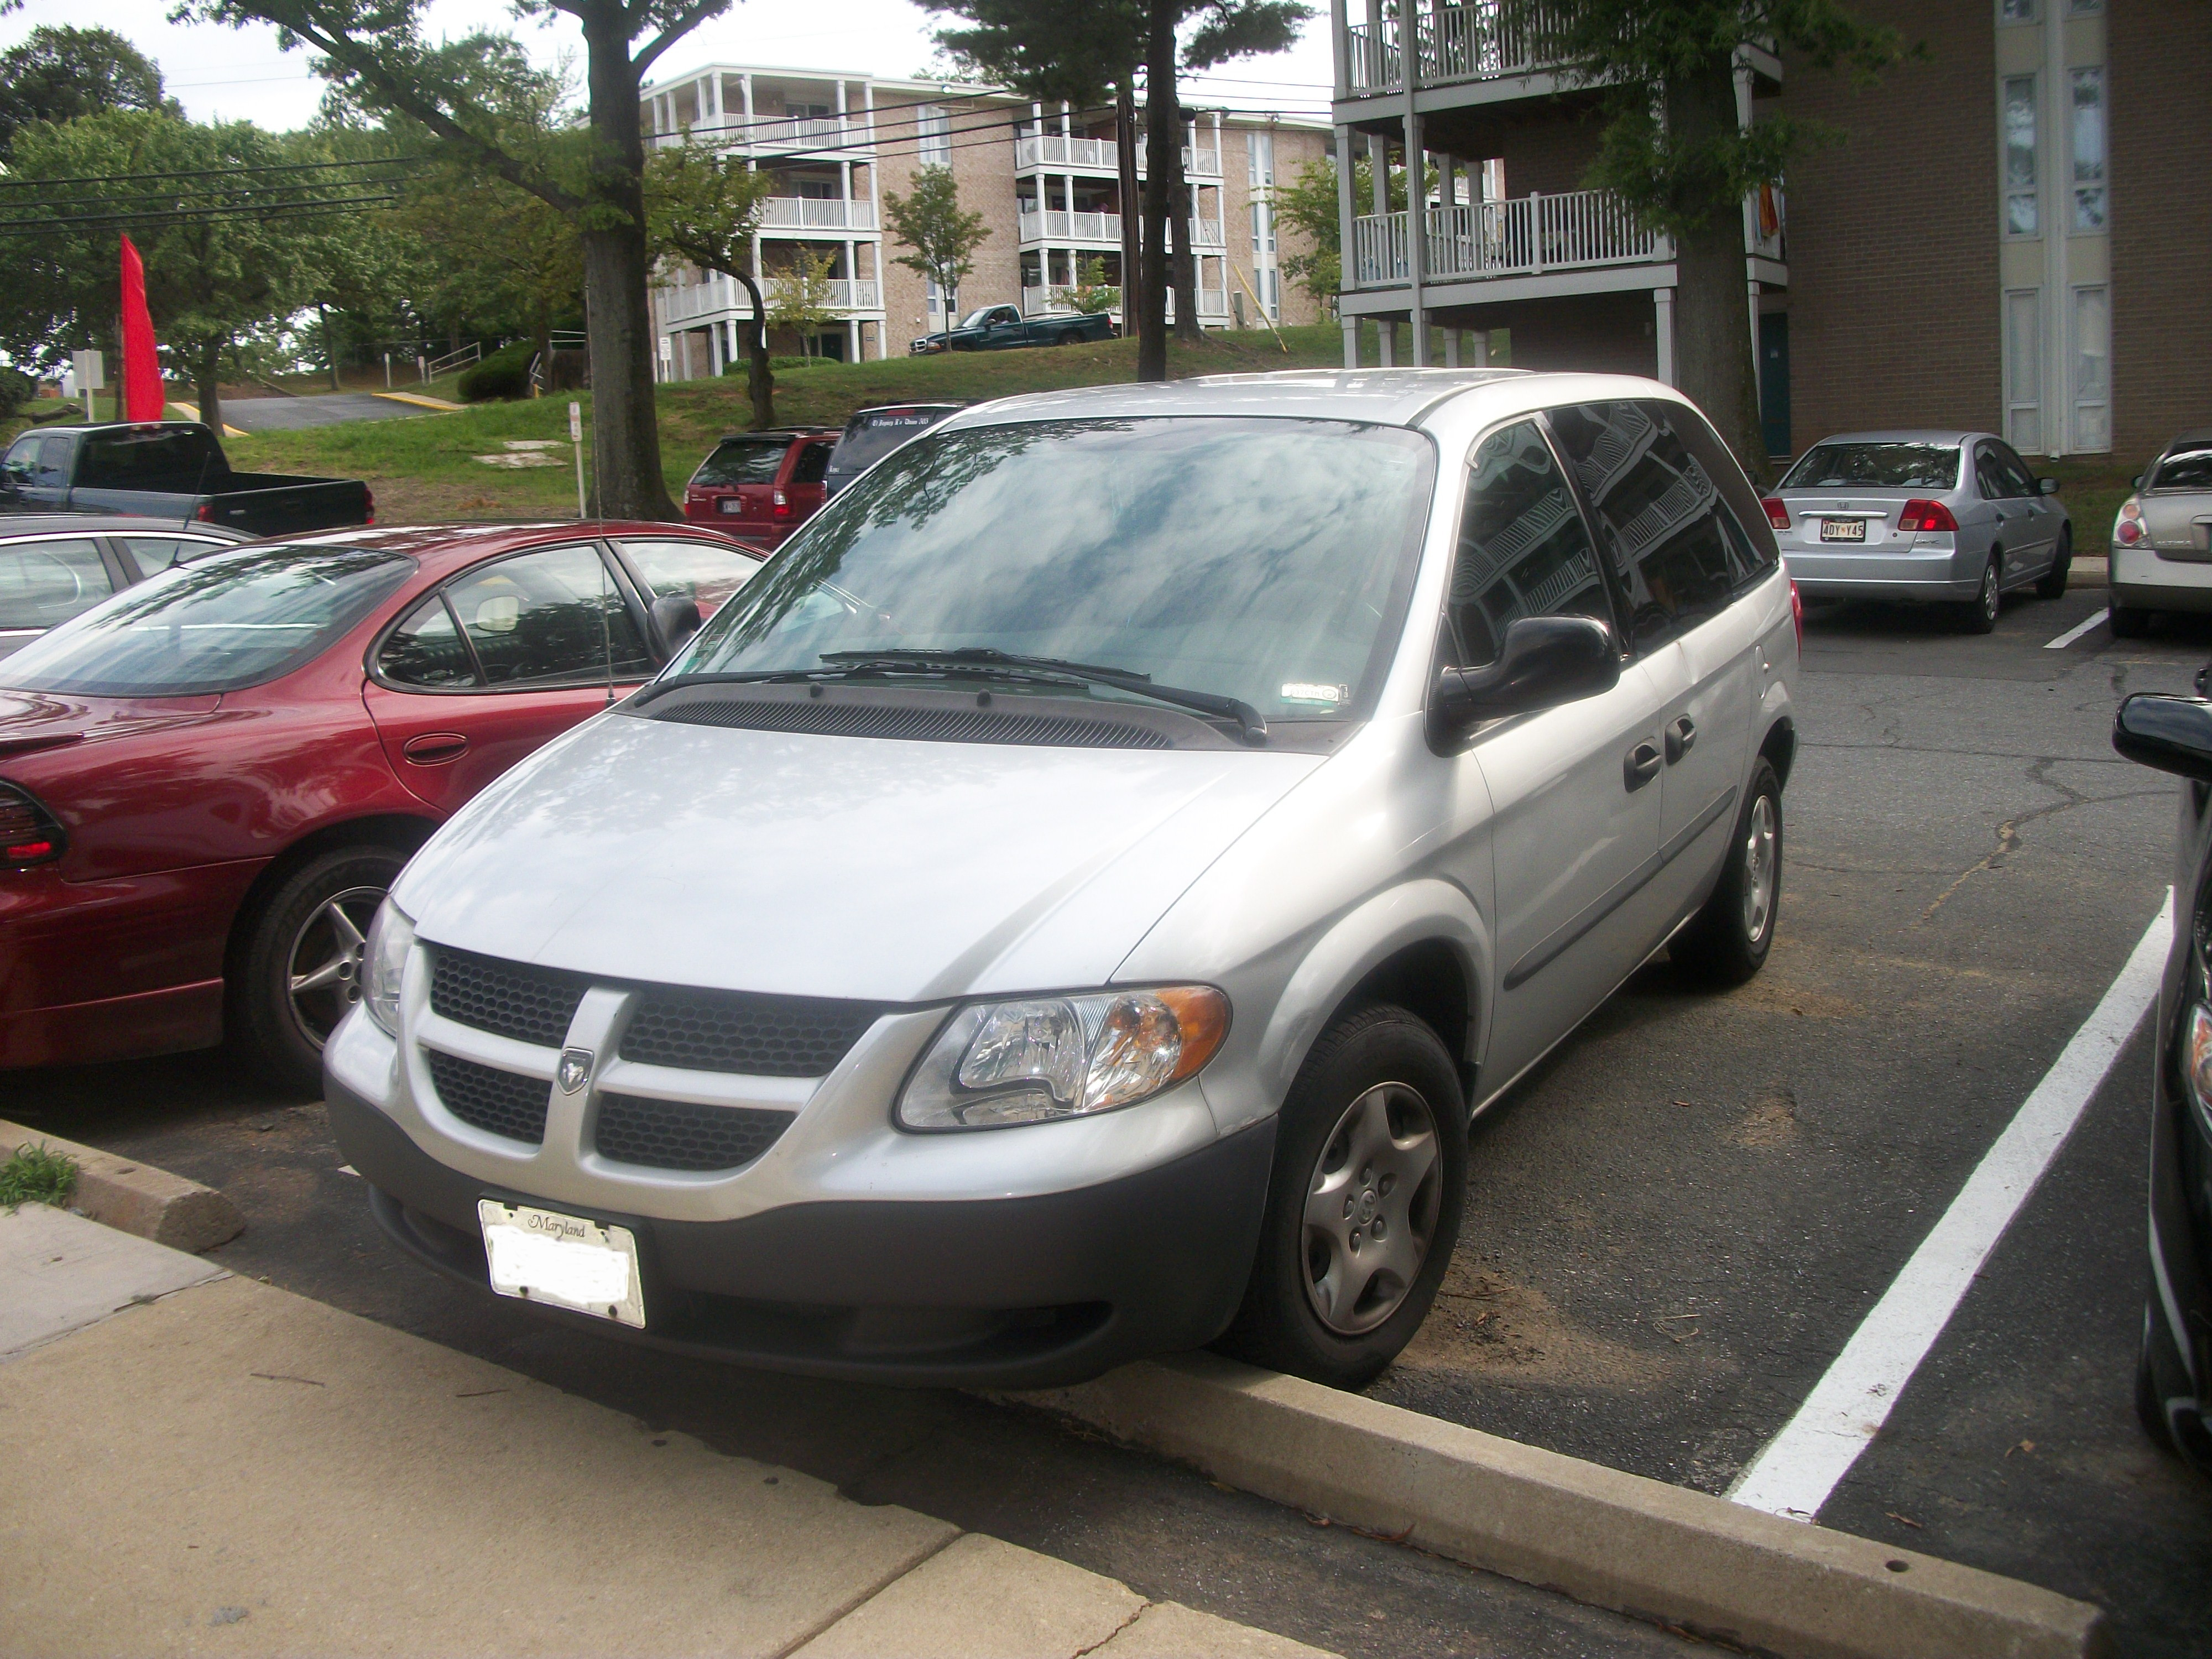 File:2003 Dodge Caravan.JPG - Wikimedia Commons